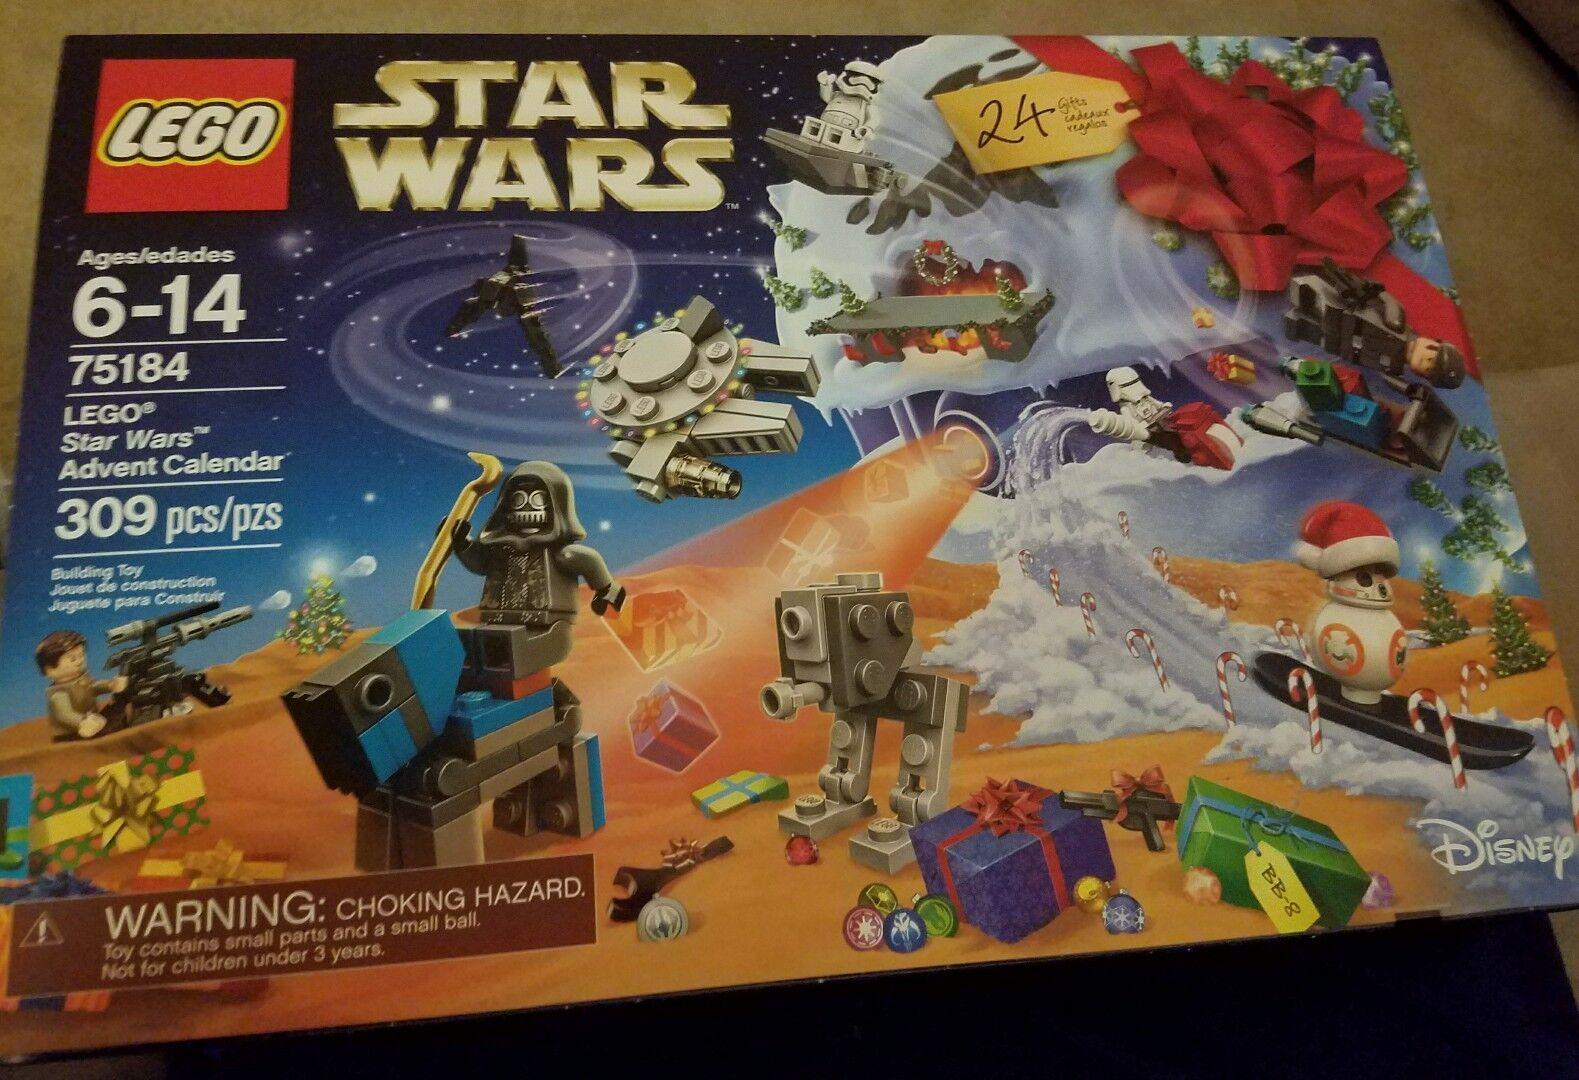 NEW  LEGO Star Wars Advent Calendar - 75184, 309 PIECES,CHRISTMAS 2017, SEALED